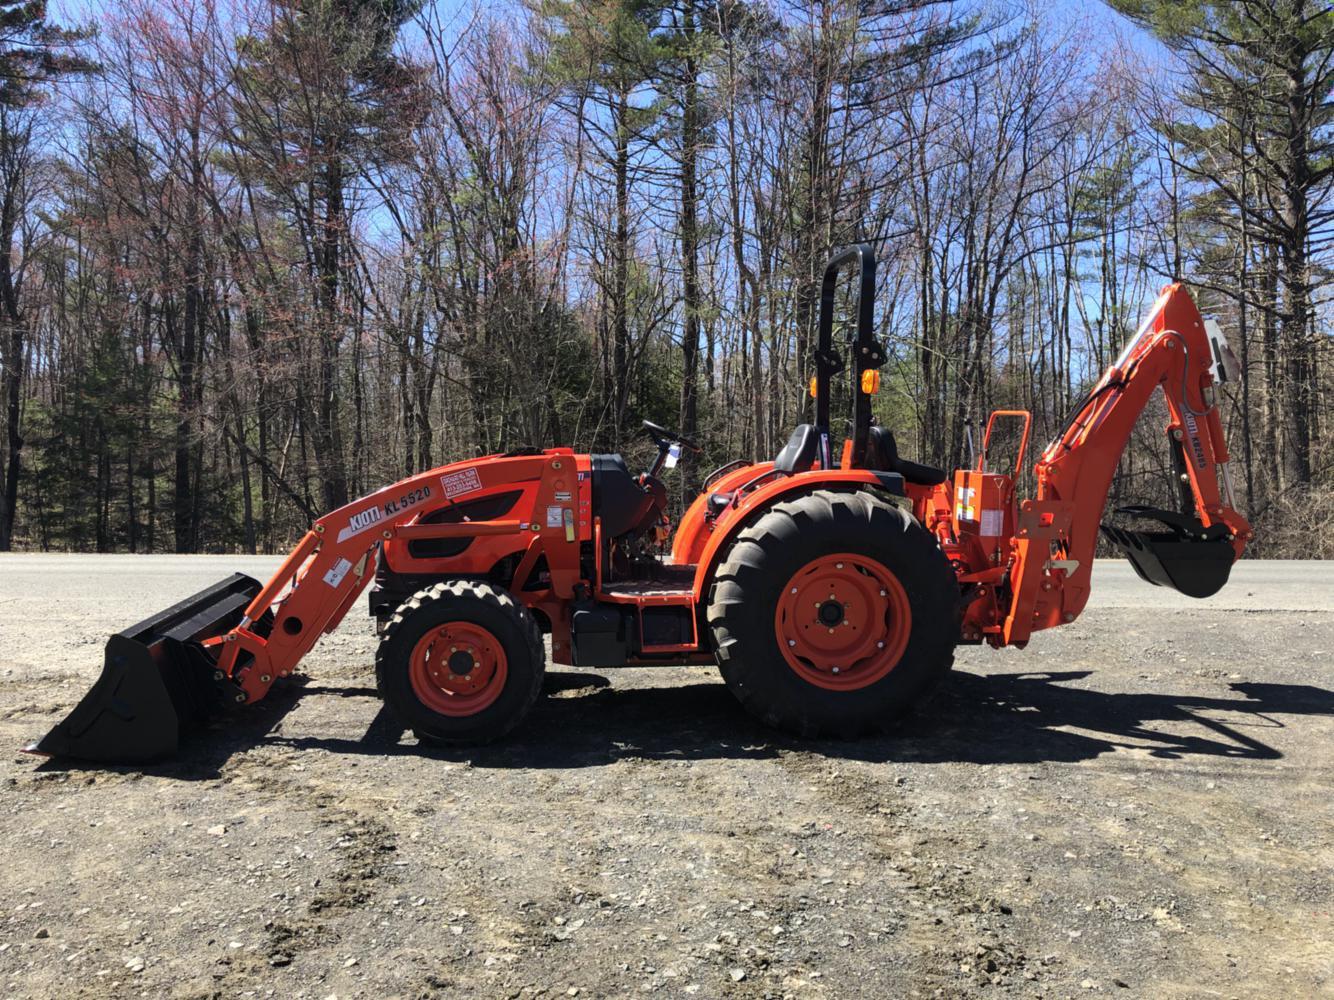 Kioti DK4210SE HST Tractor w/ Loader & Backhoe for sale in